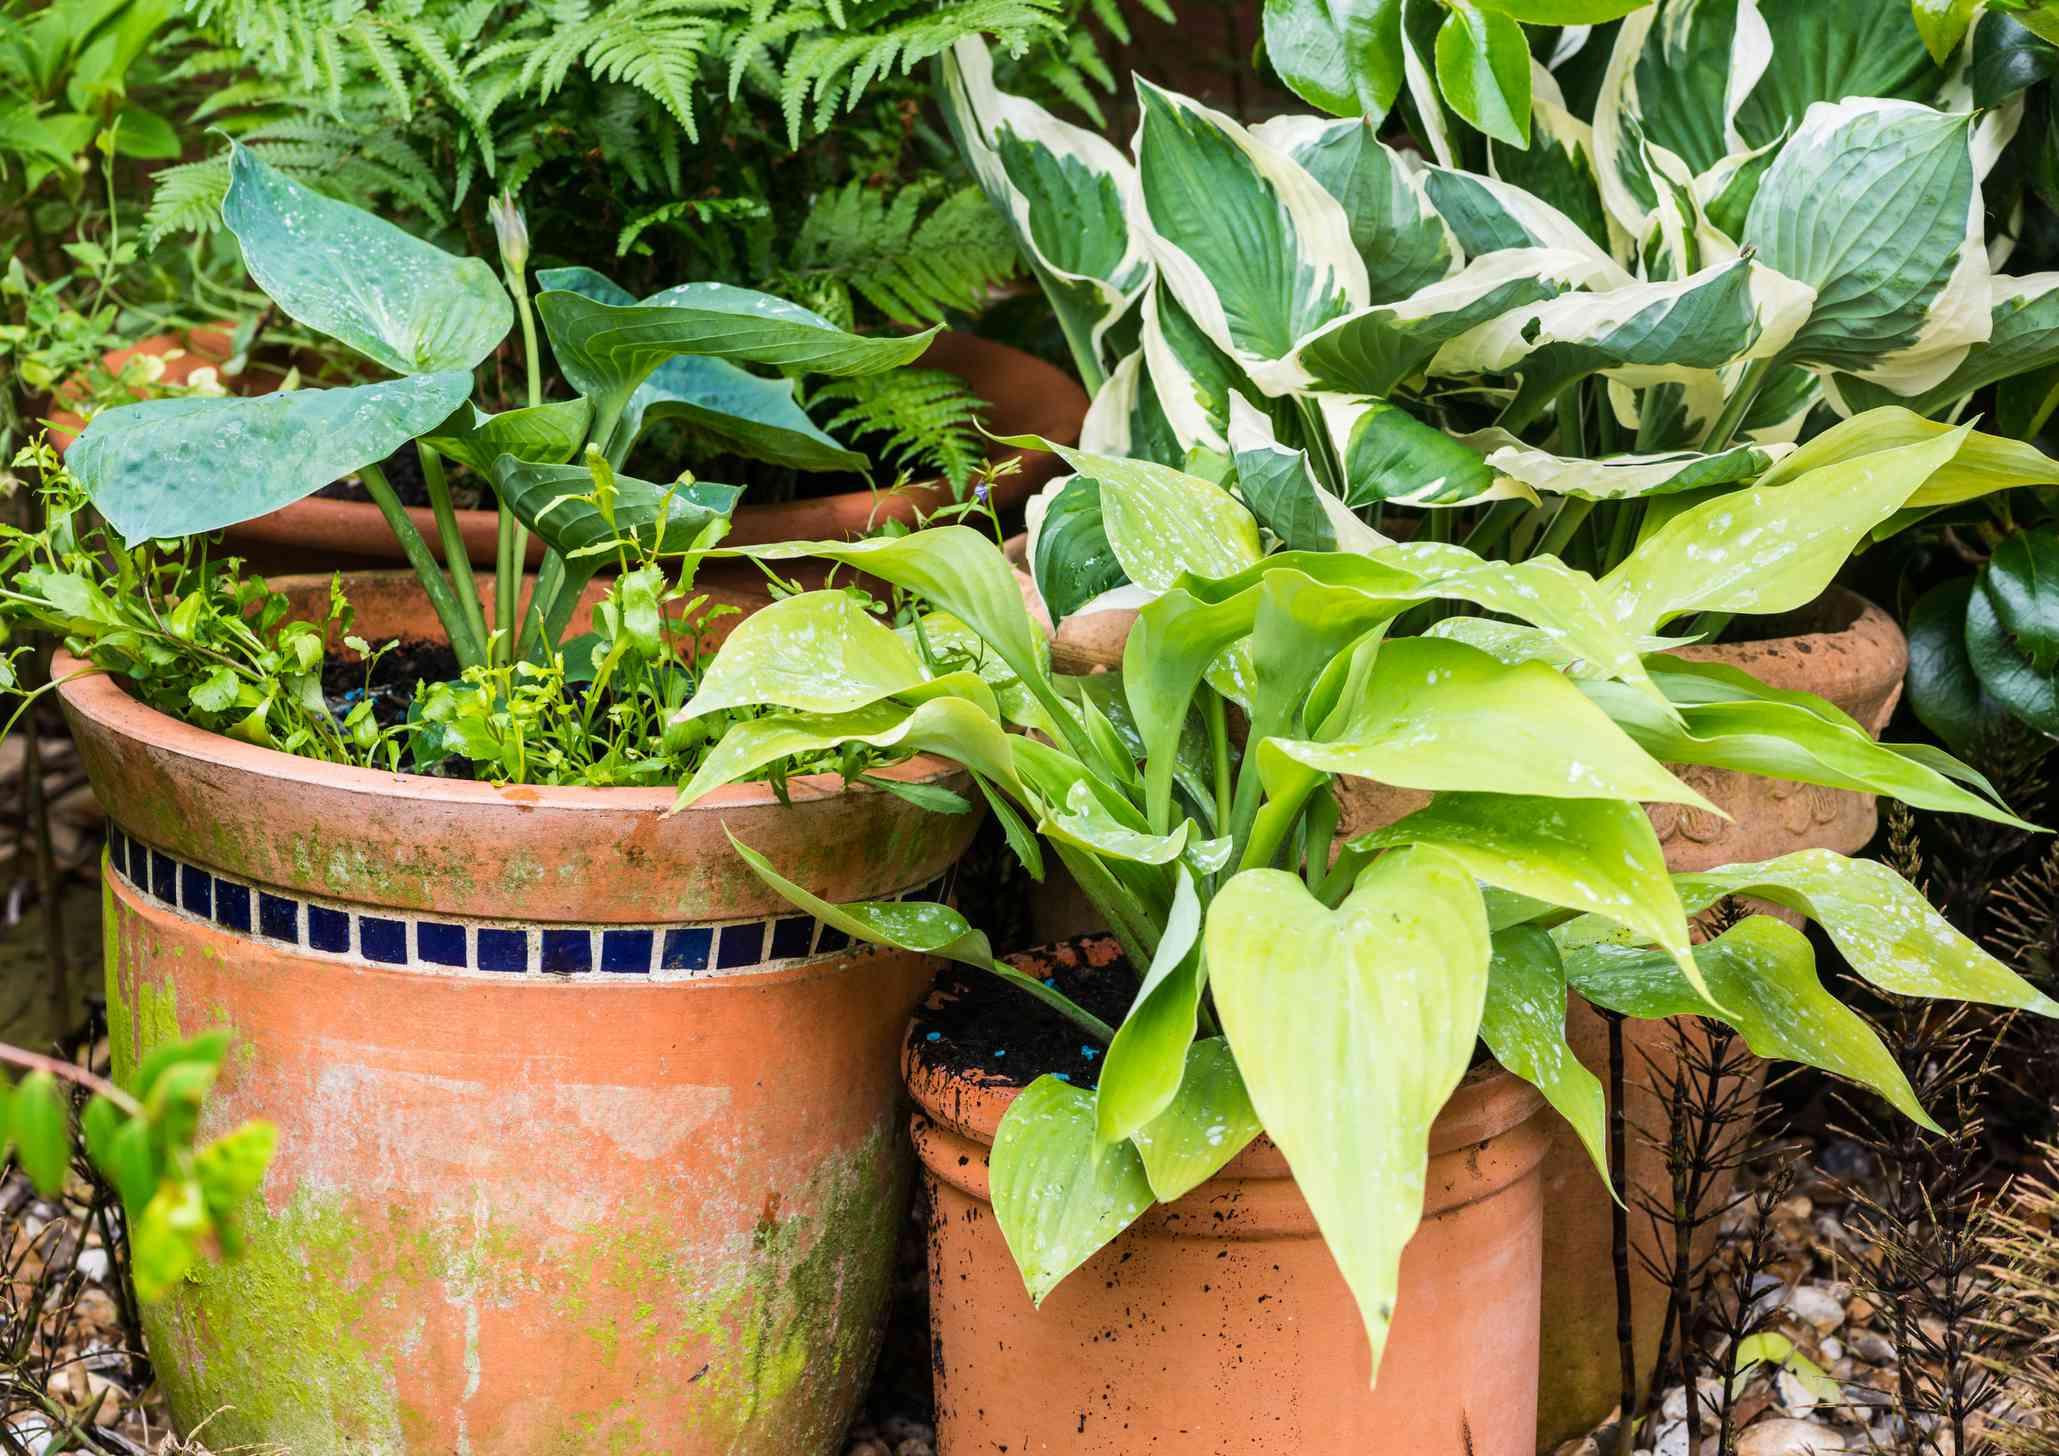 A shot of some hosta plants in terracotta pots.